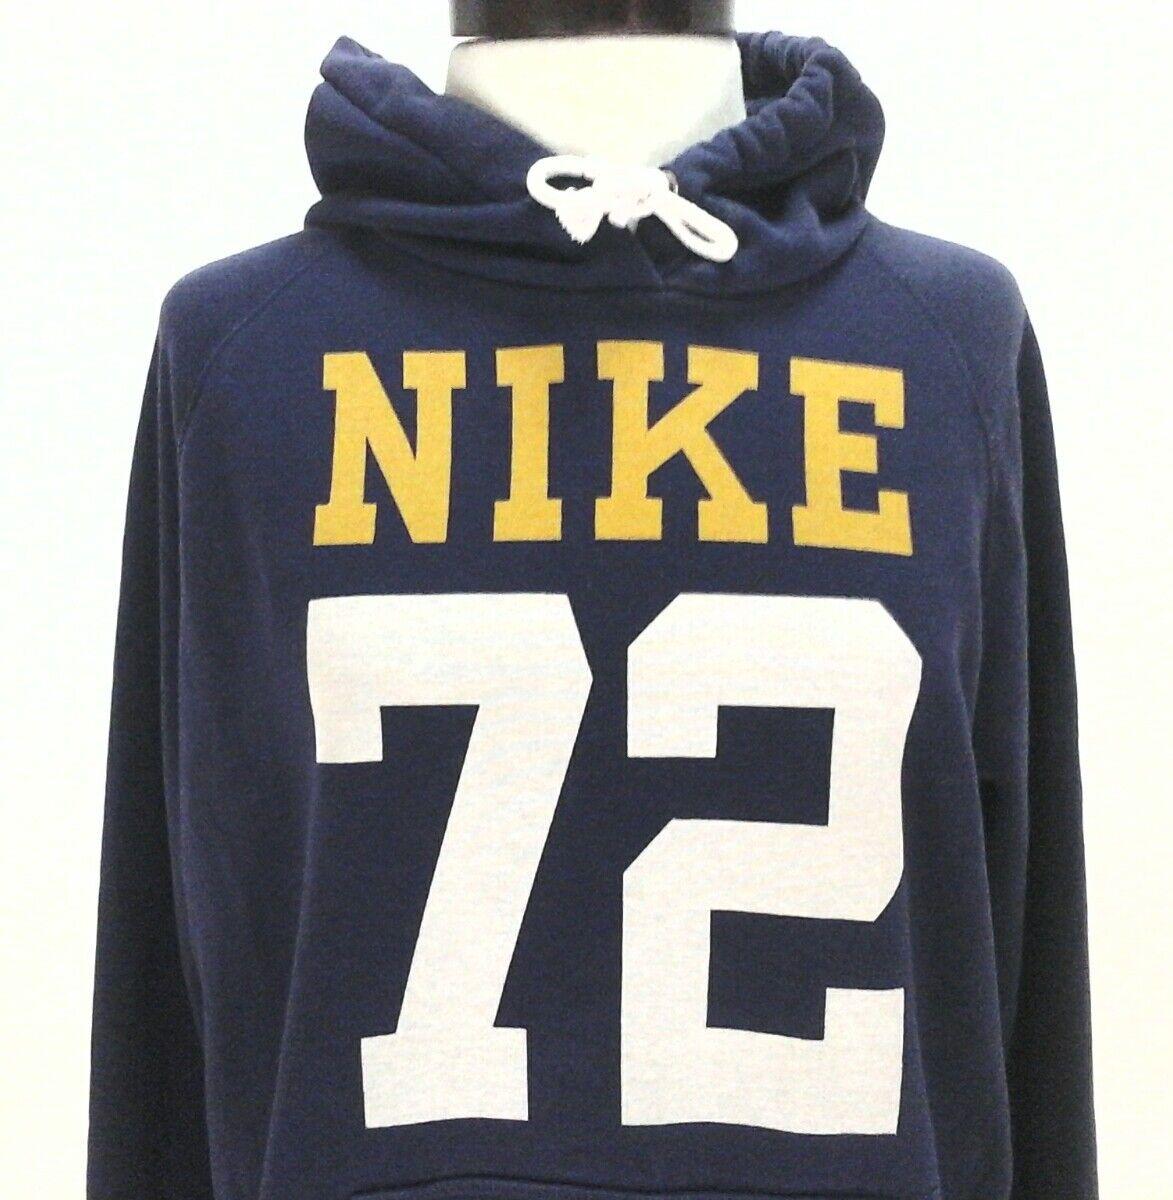 25e91dbd12ea NIKE Hoodie Jacket ATHLETIC DEPT Pullover Sweatshirt Purple Yellow 72  Women s L